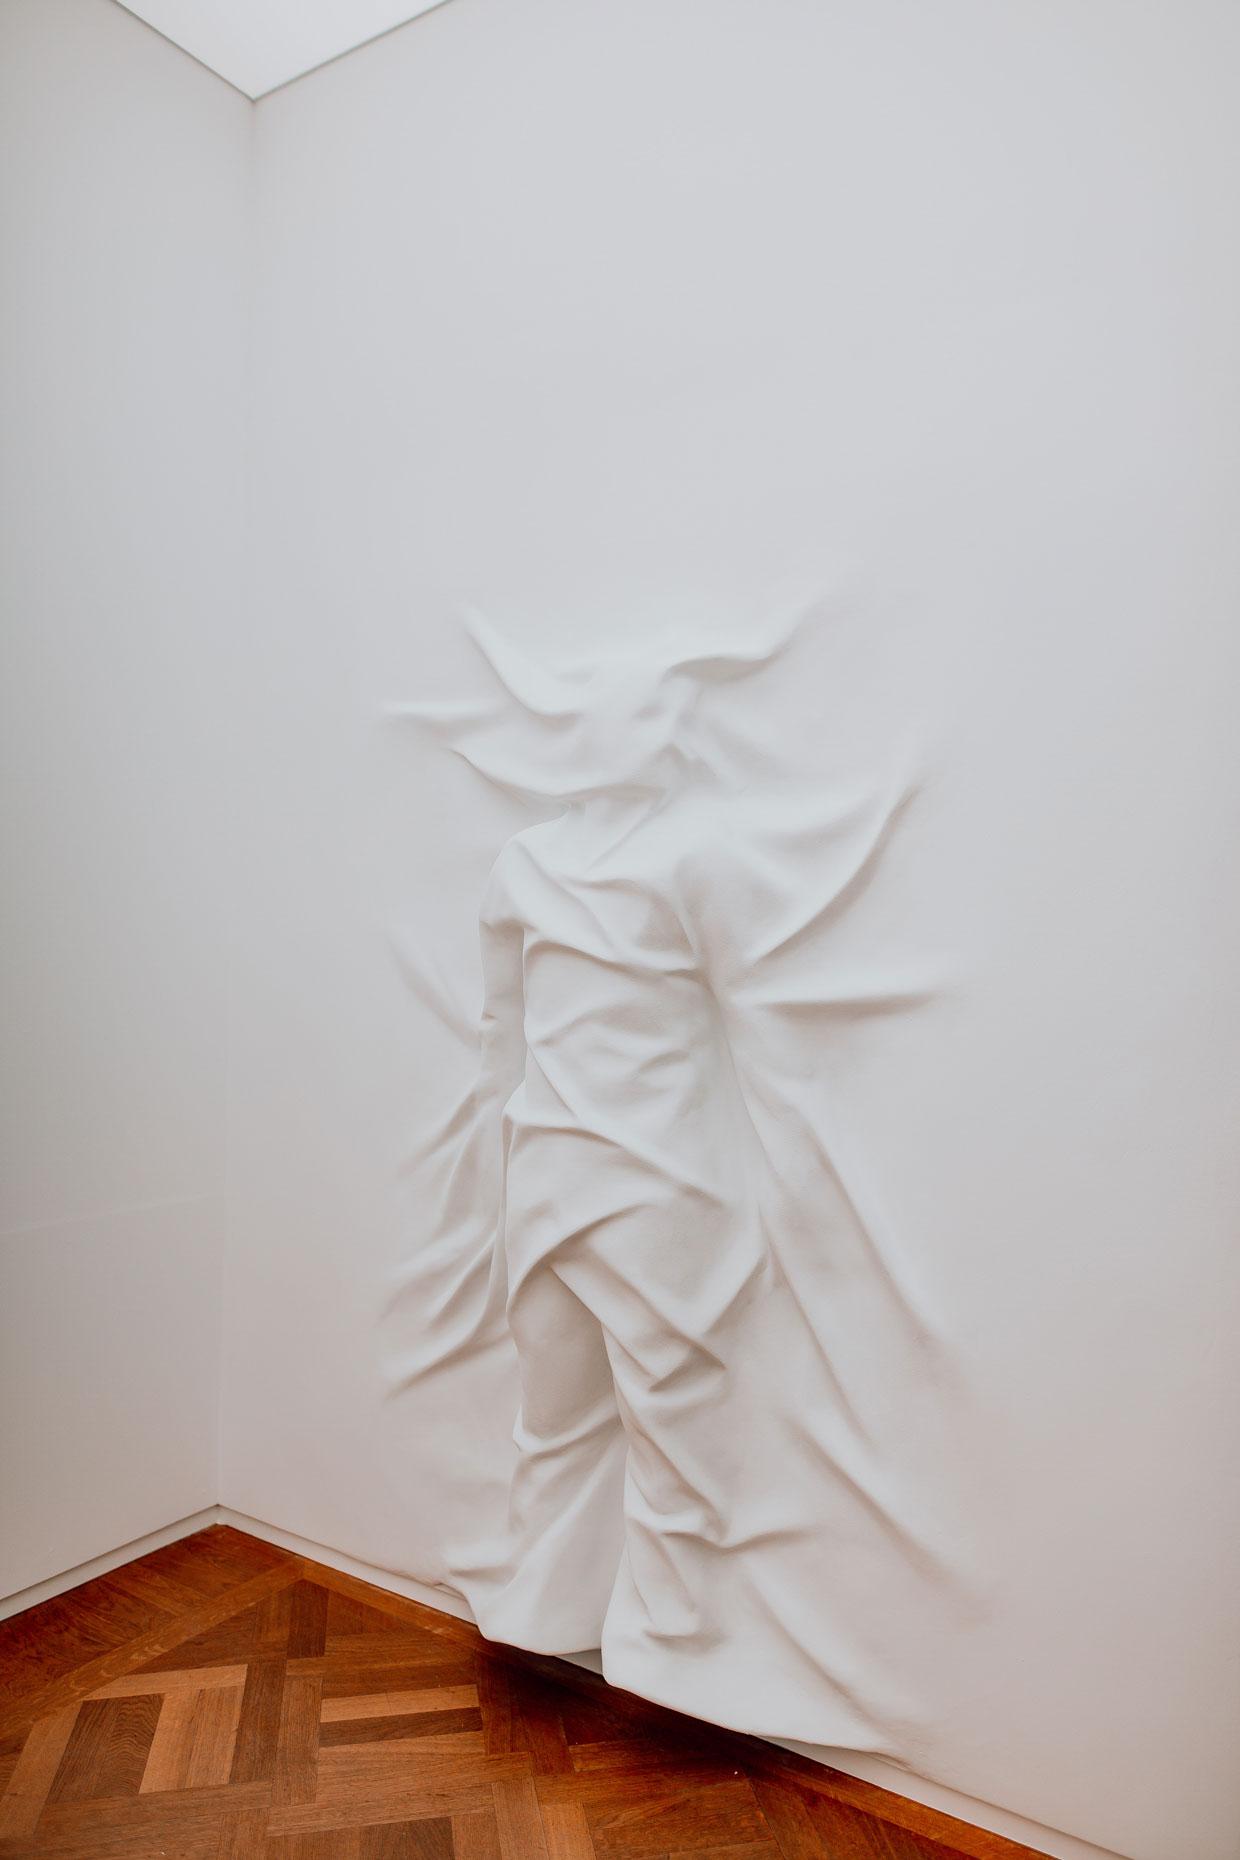 © MOCO Amsterdam, Daniel Arsham, Hiding Figure